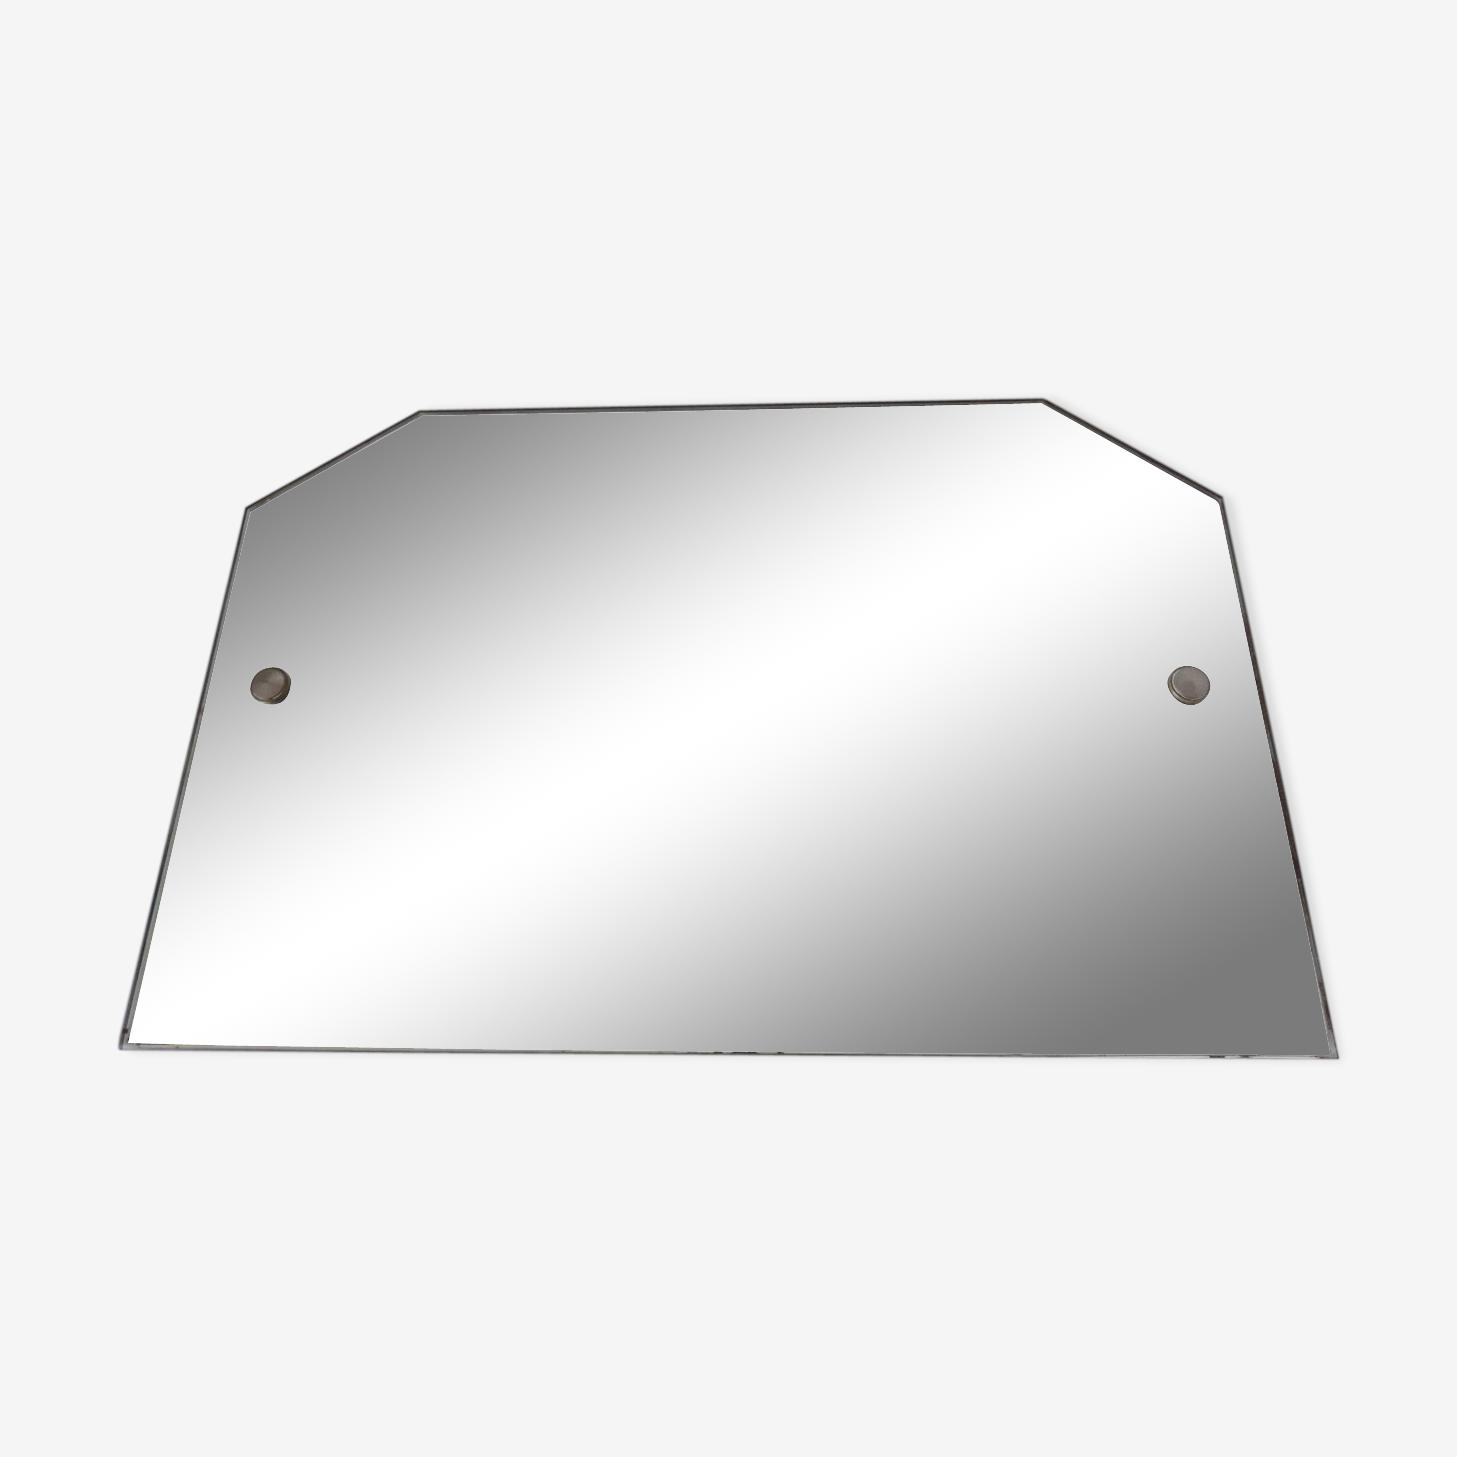 Hexagonal mirror with rope 30/40 - 54x36cm